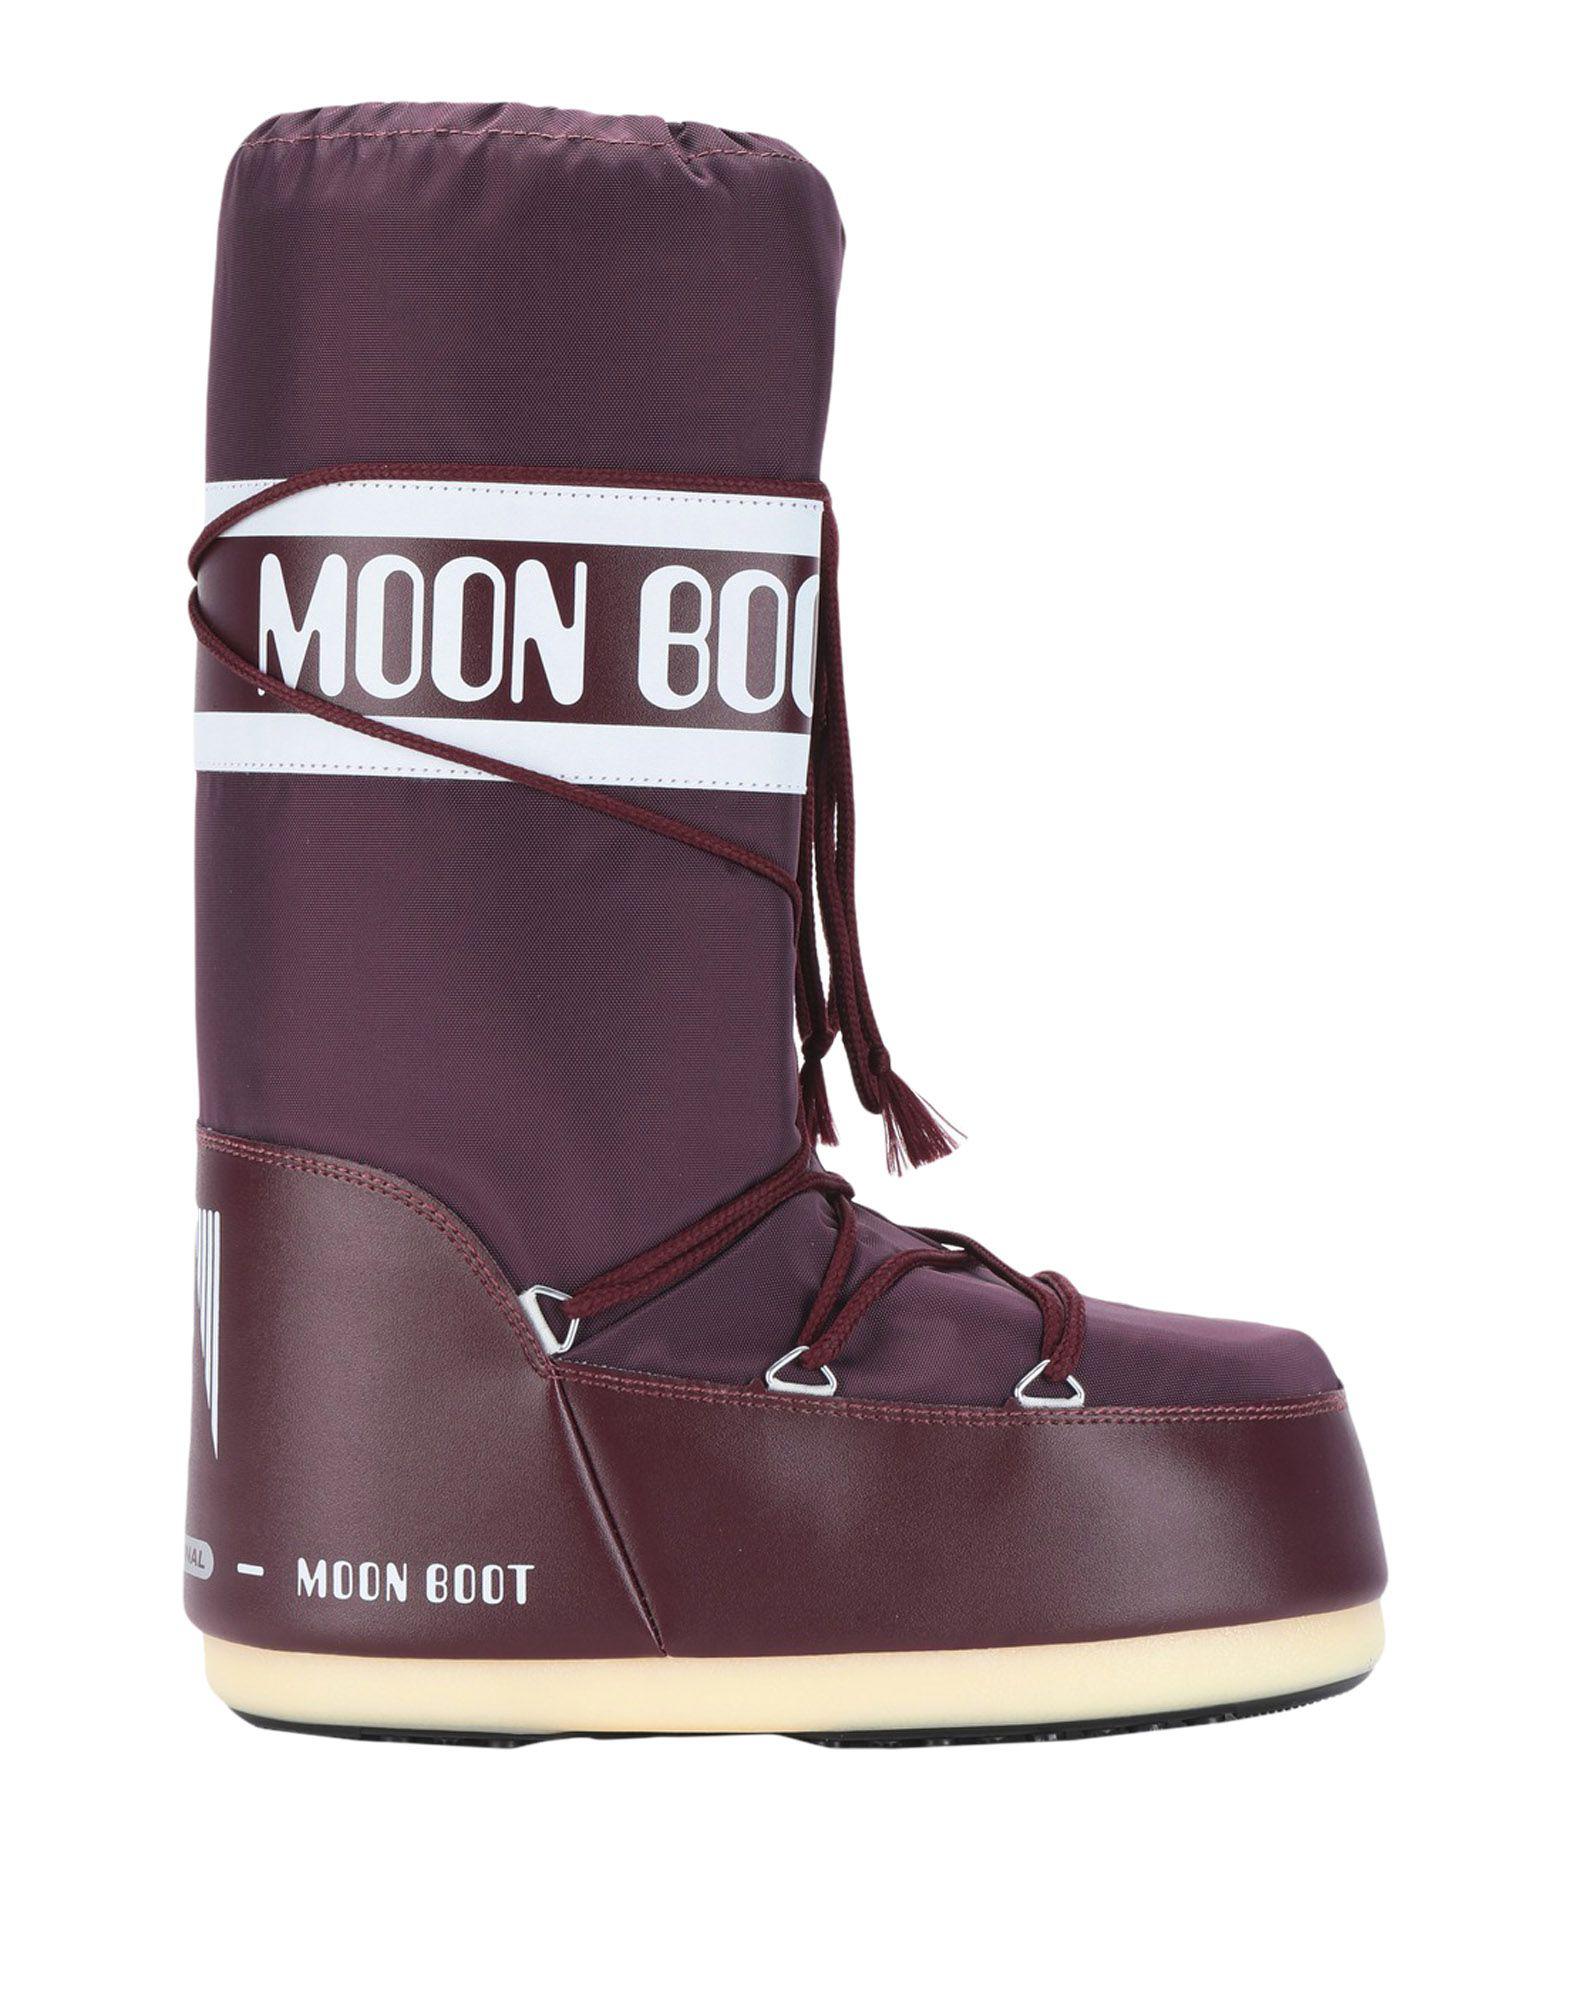 Moon Boot Boots In Deep Purple